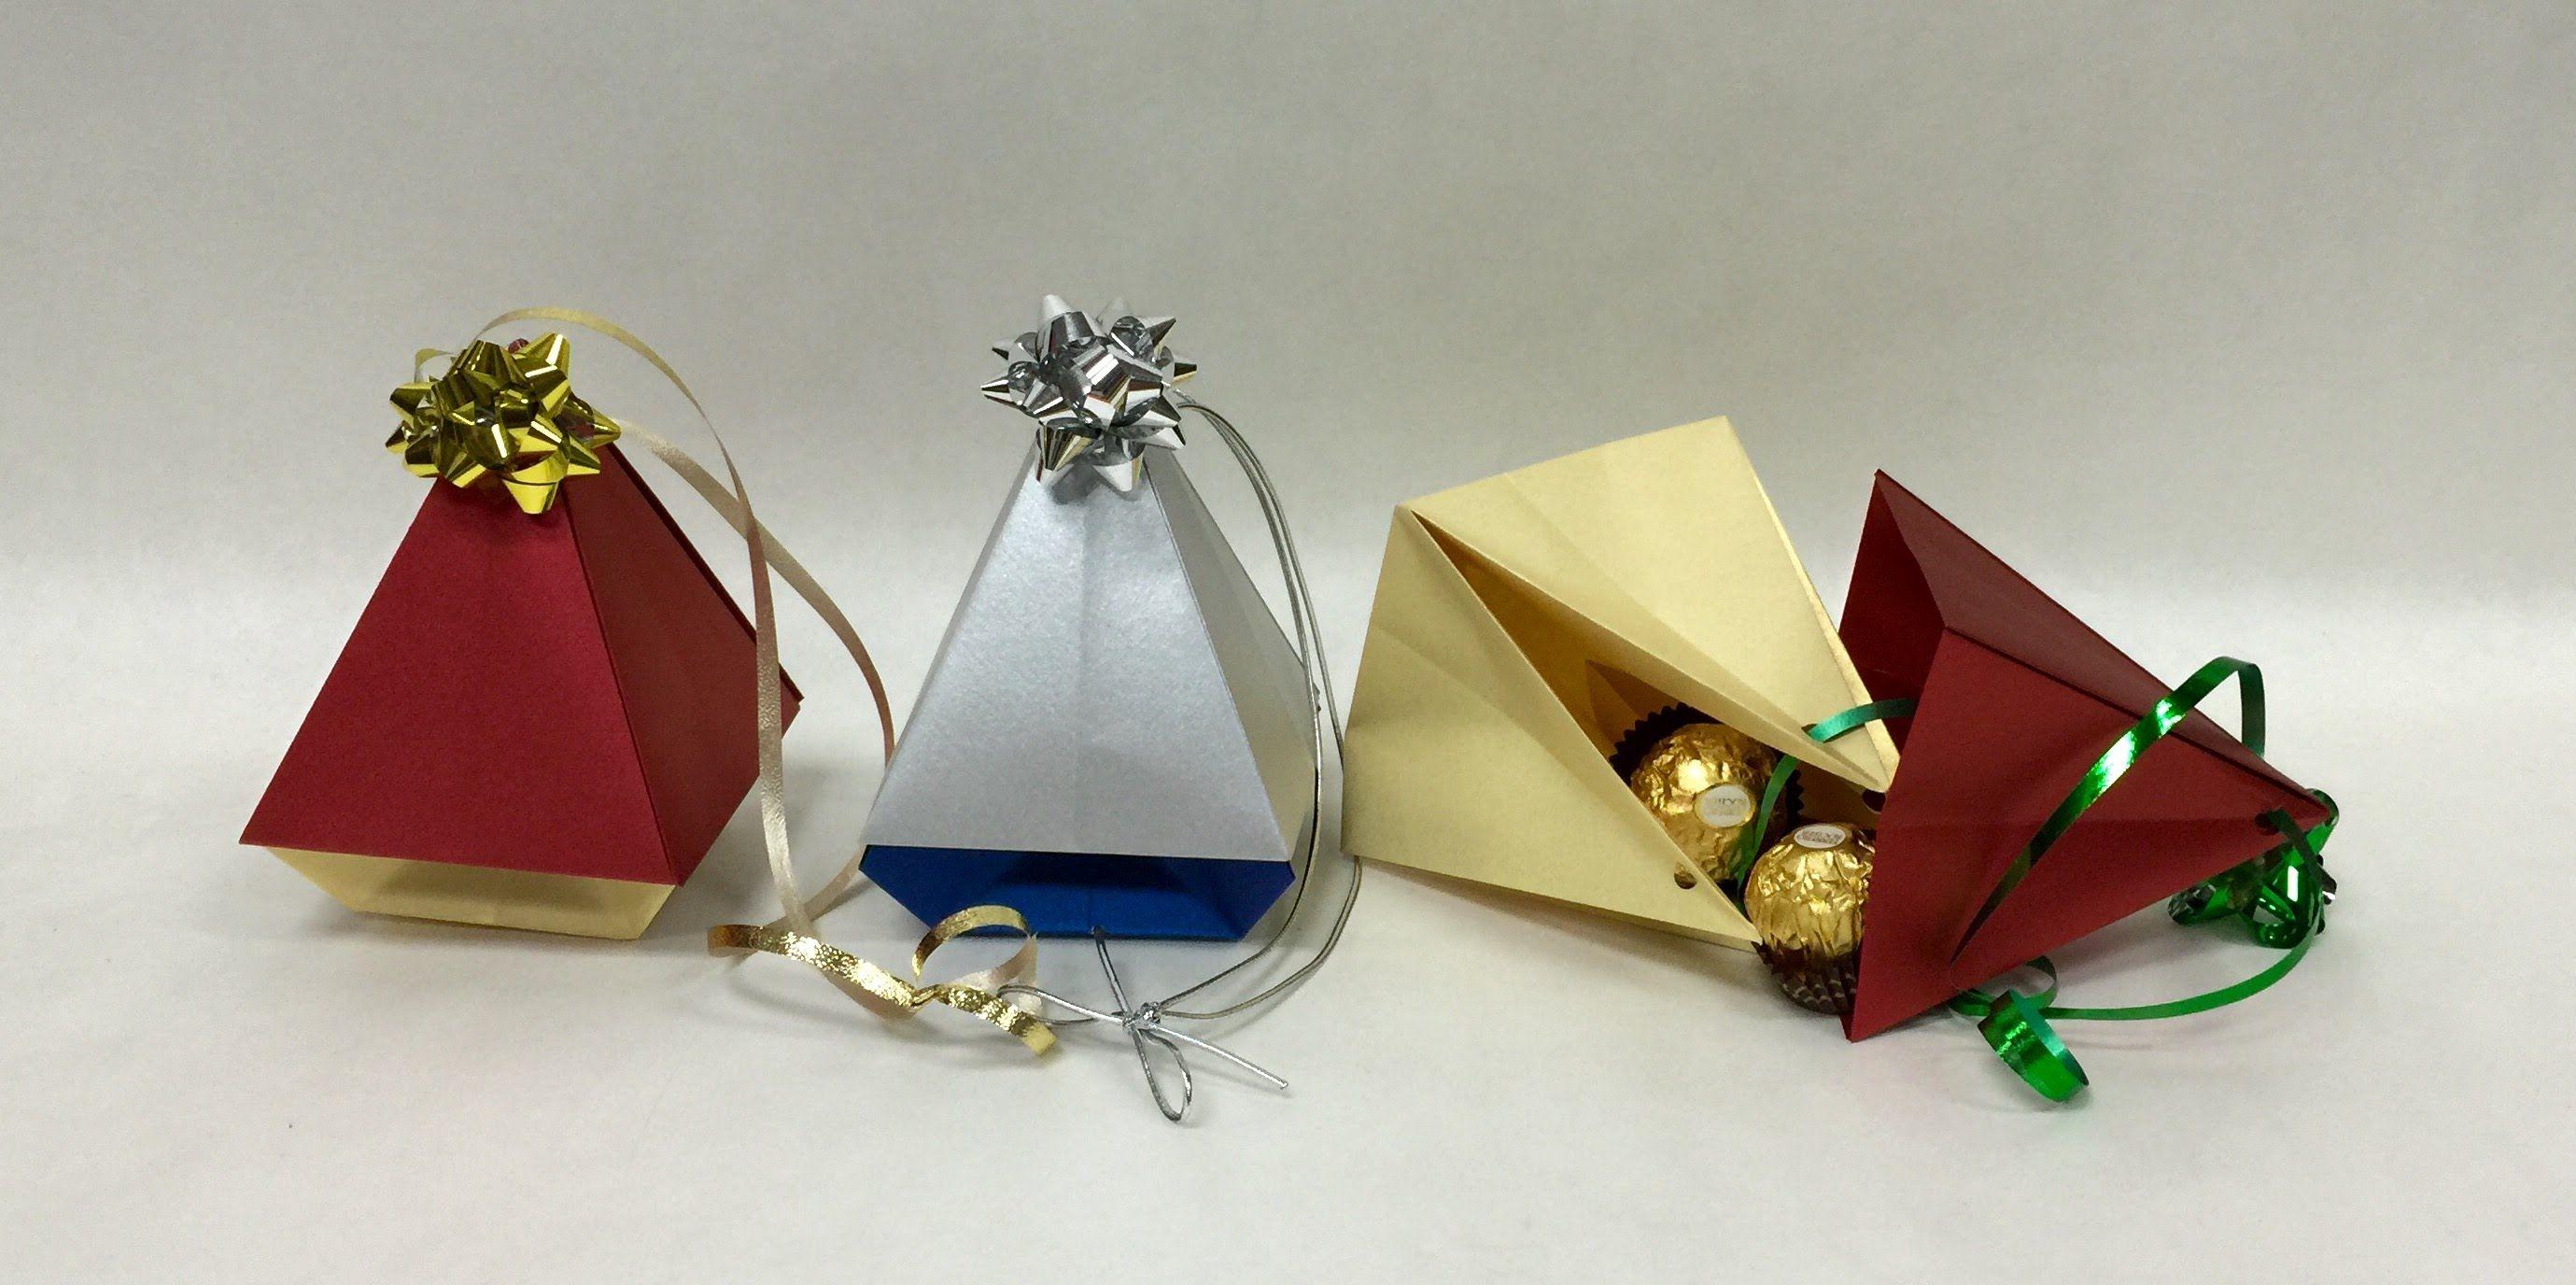 Christmas Tree Ornament Origami Box Origami Ornaments Origami Christmas Tree Diy Paper Christmas Tree